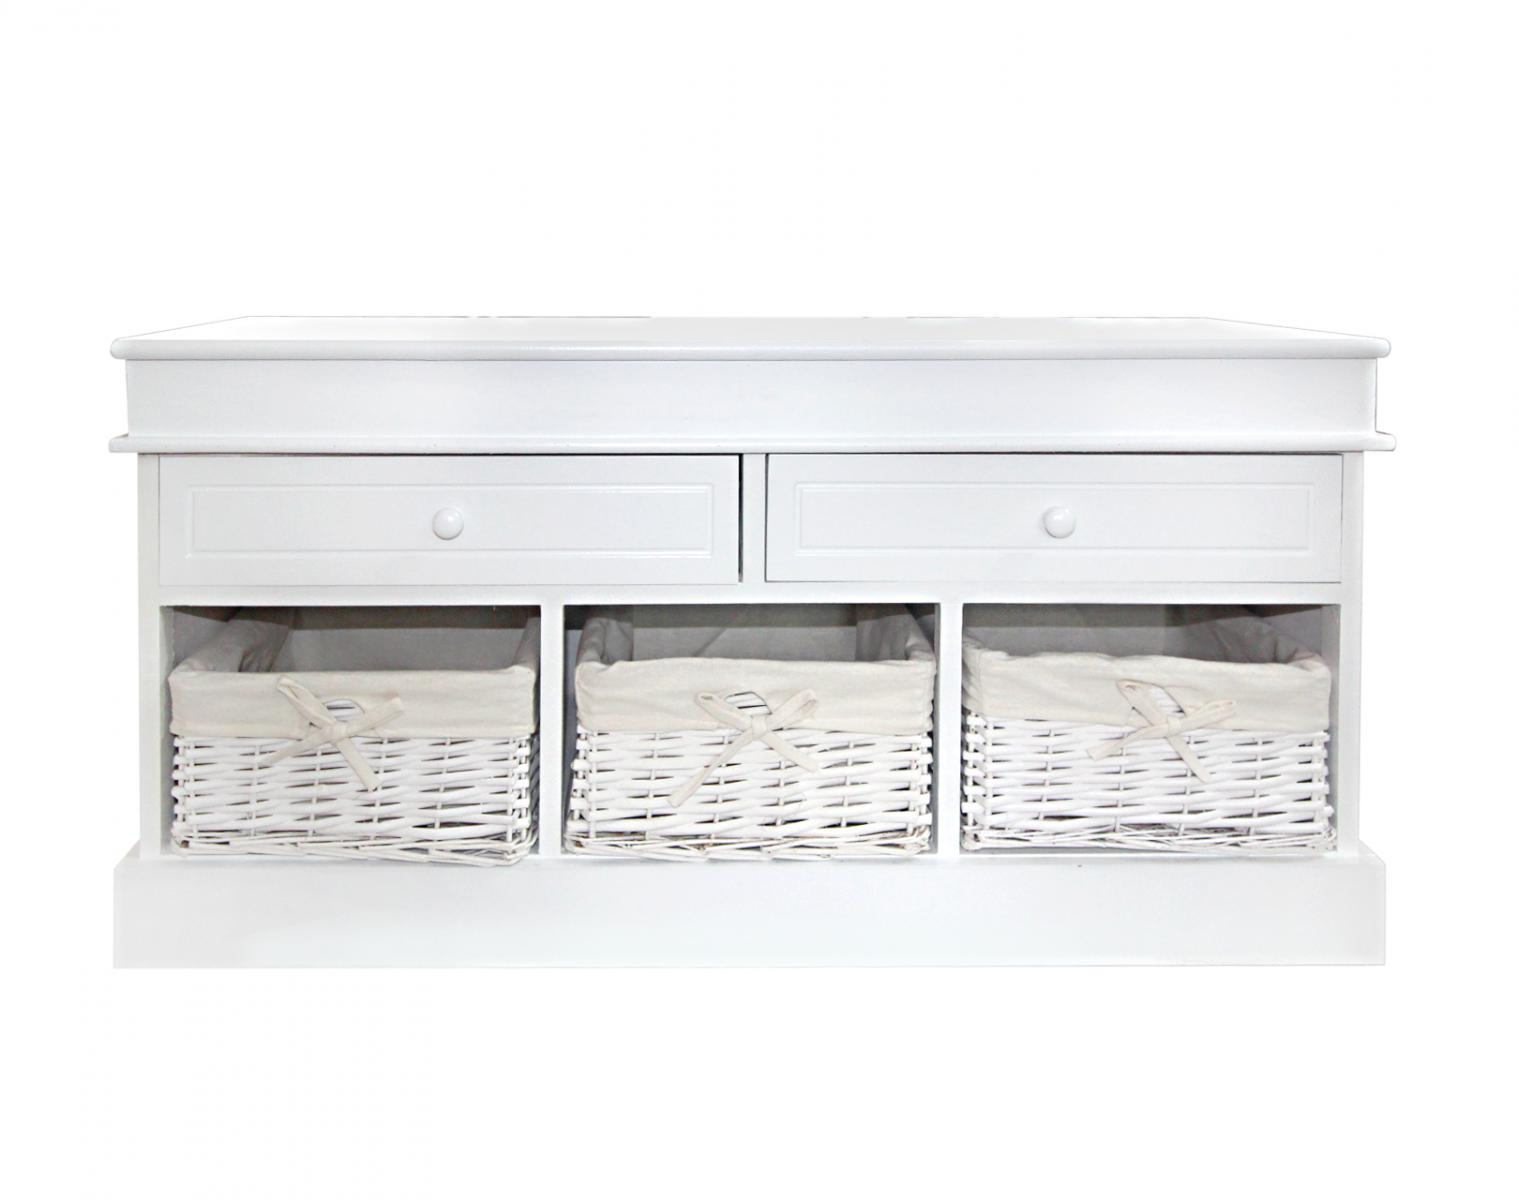 Panca panchina contenitore bianca con 3 cestini in vimini - Panca ikea bagno ...